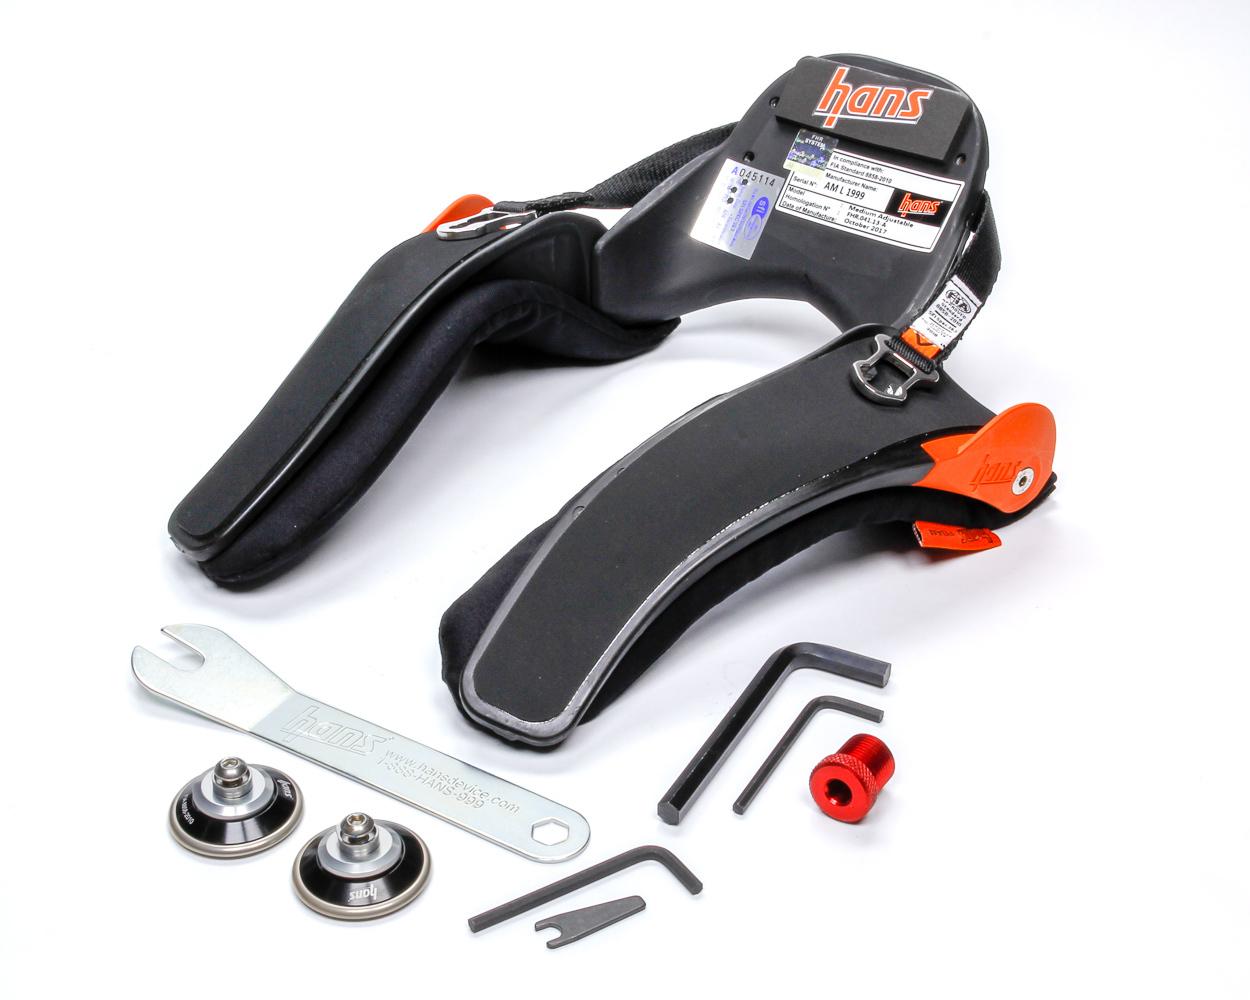 Hans DK13034.32FIA/SFI Head and Neck Support, SFI 38.1, FIA Approved, Sliding Post Tether, Adjustable 10 to 40 Degree, Helmet Anchor, Carbon Fiber, Medium, Kit